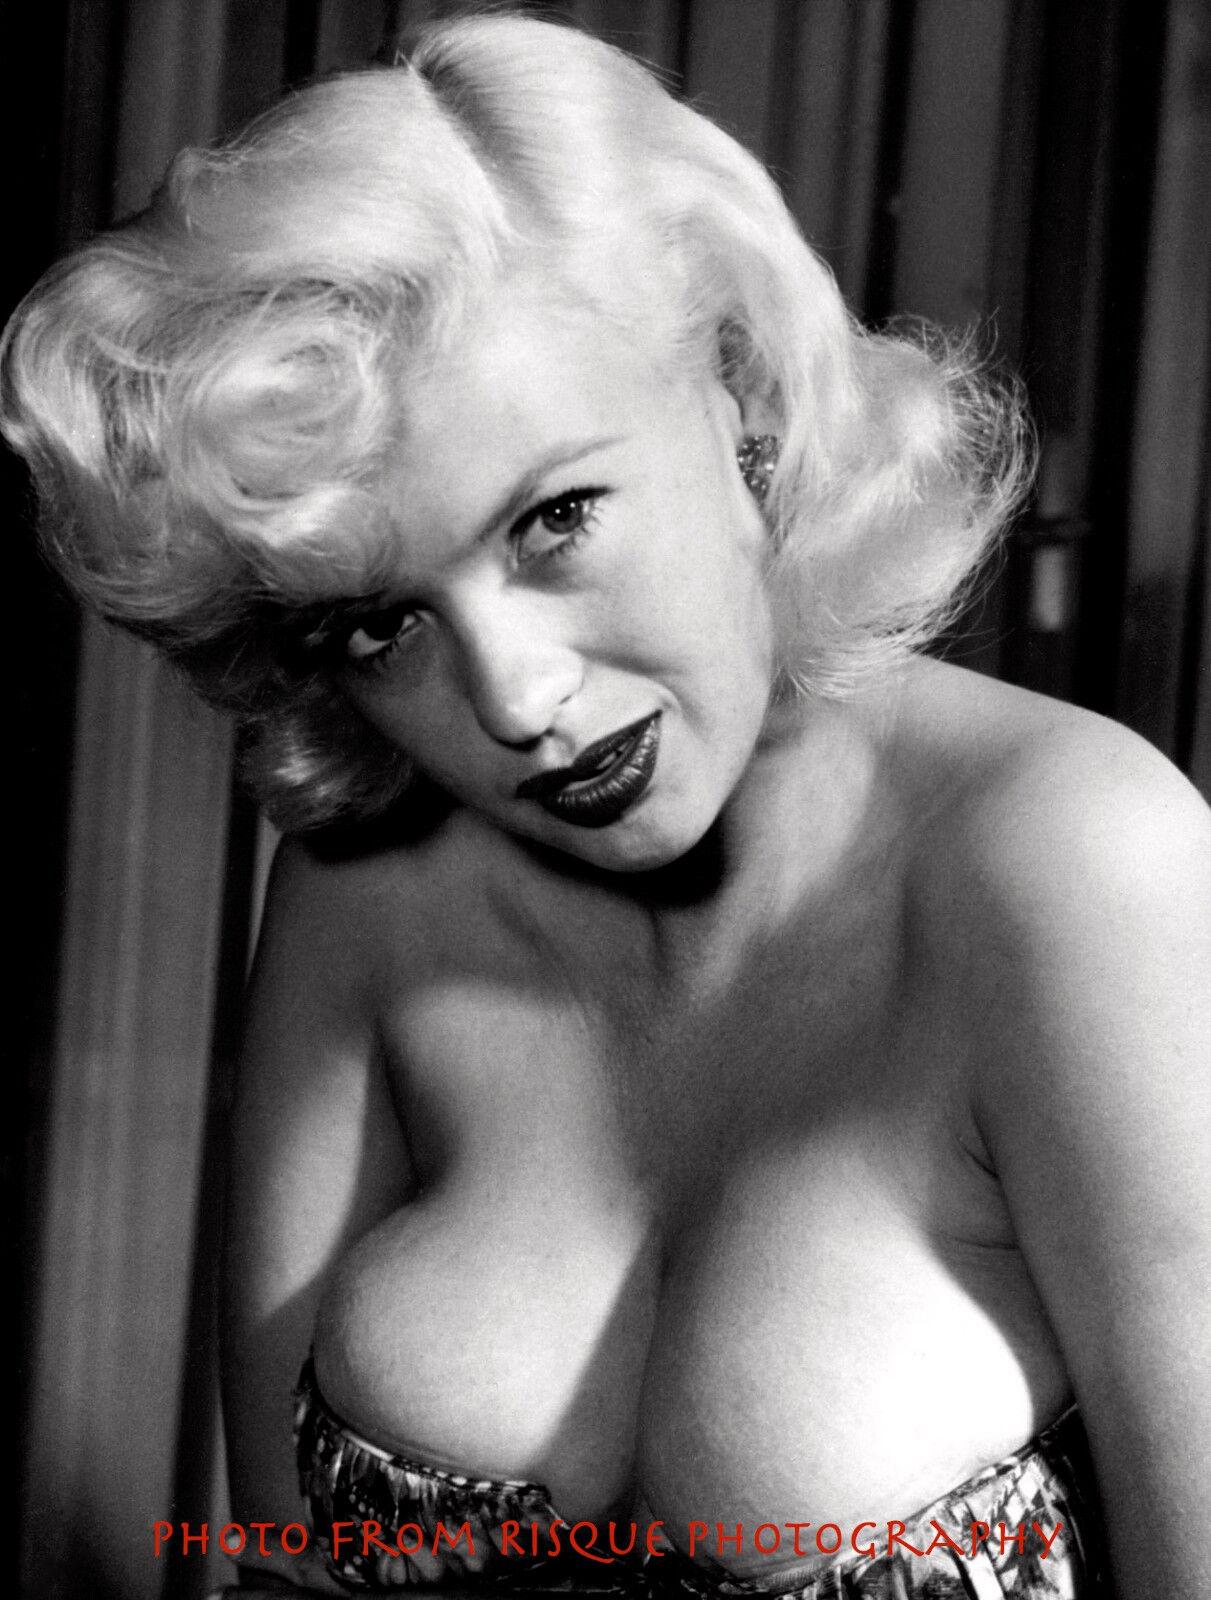 Pussy masturbating sex with a movie star